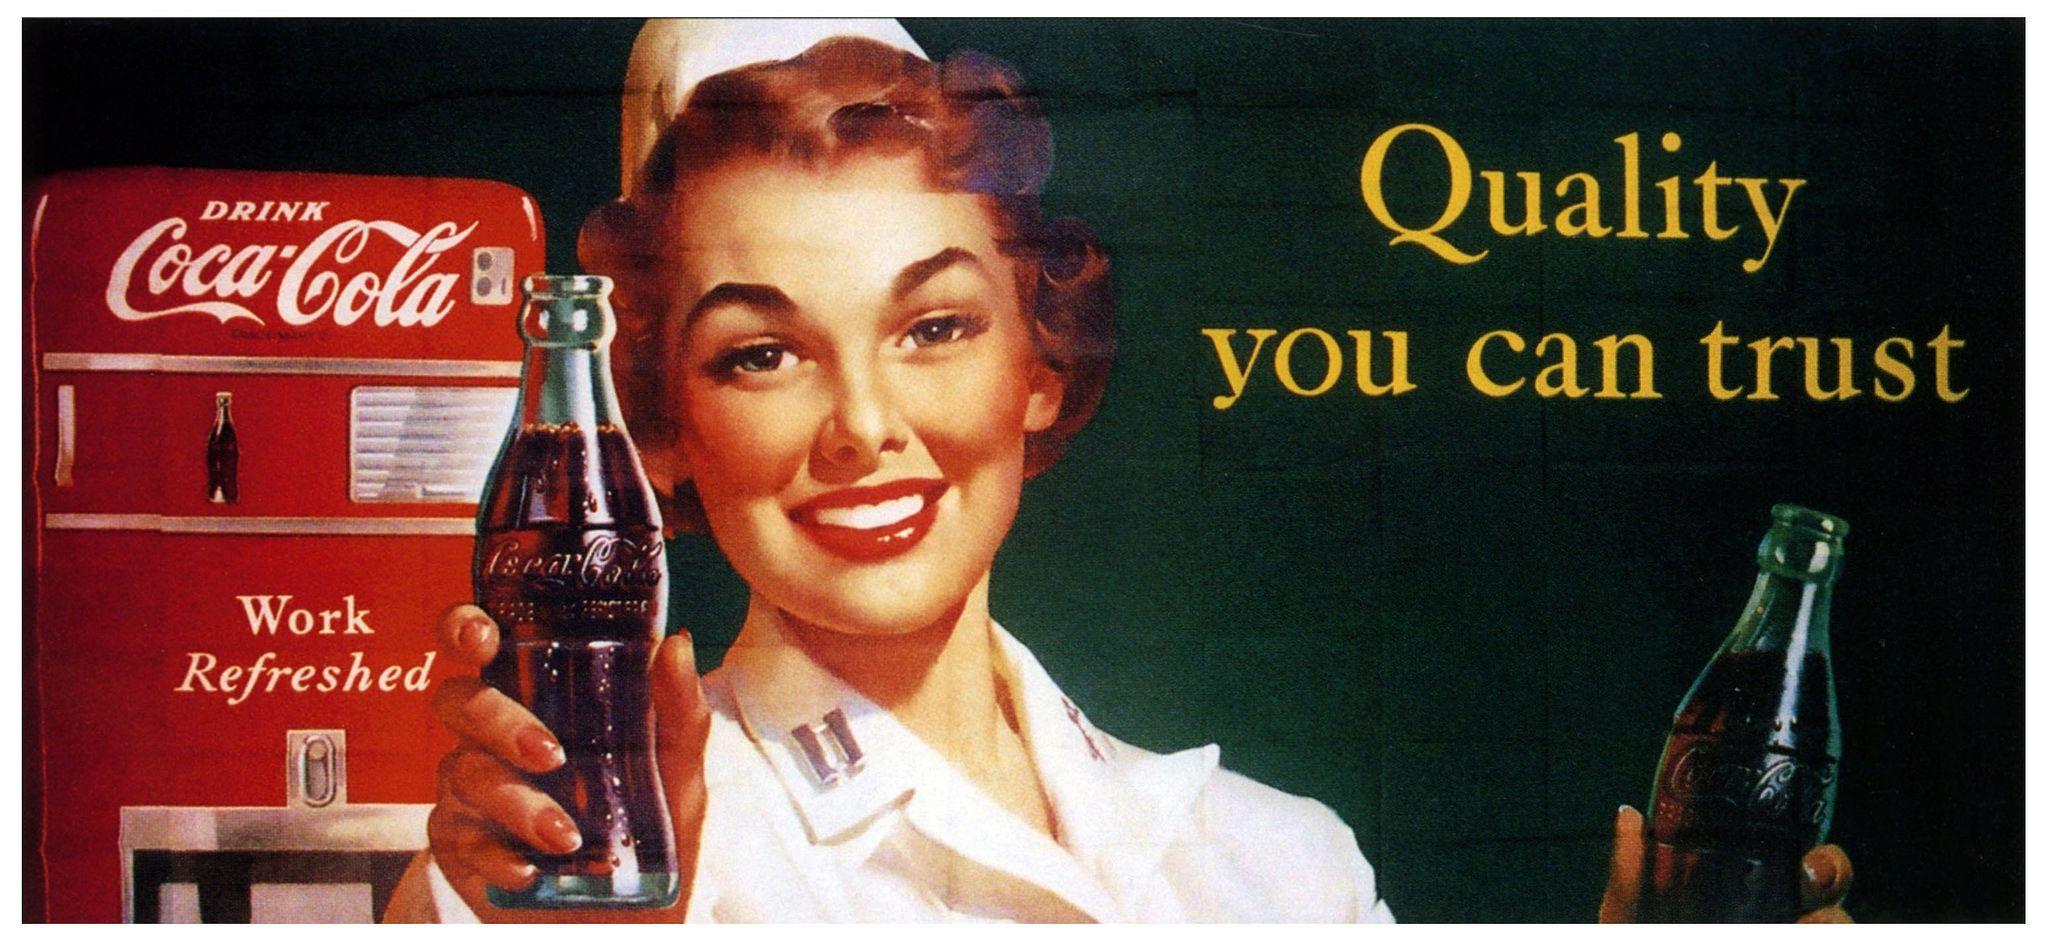 Quality You Can Trust in 2019 | Soda Pop Art | Coke ad